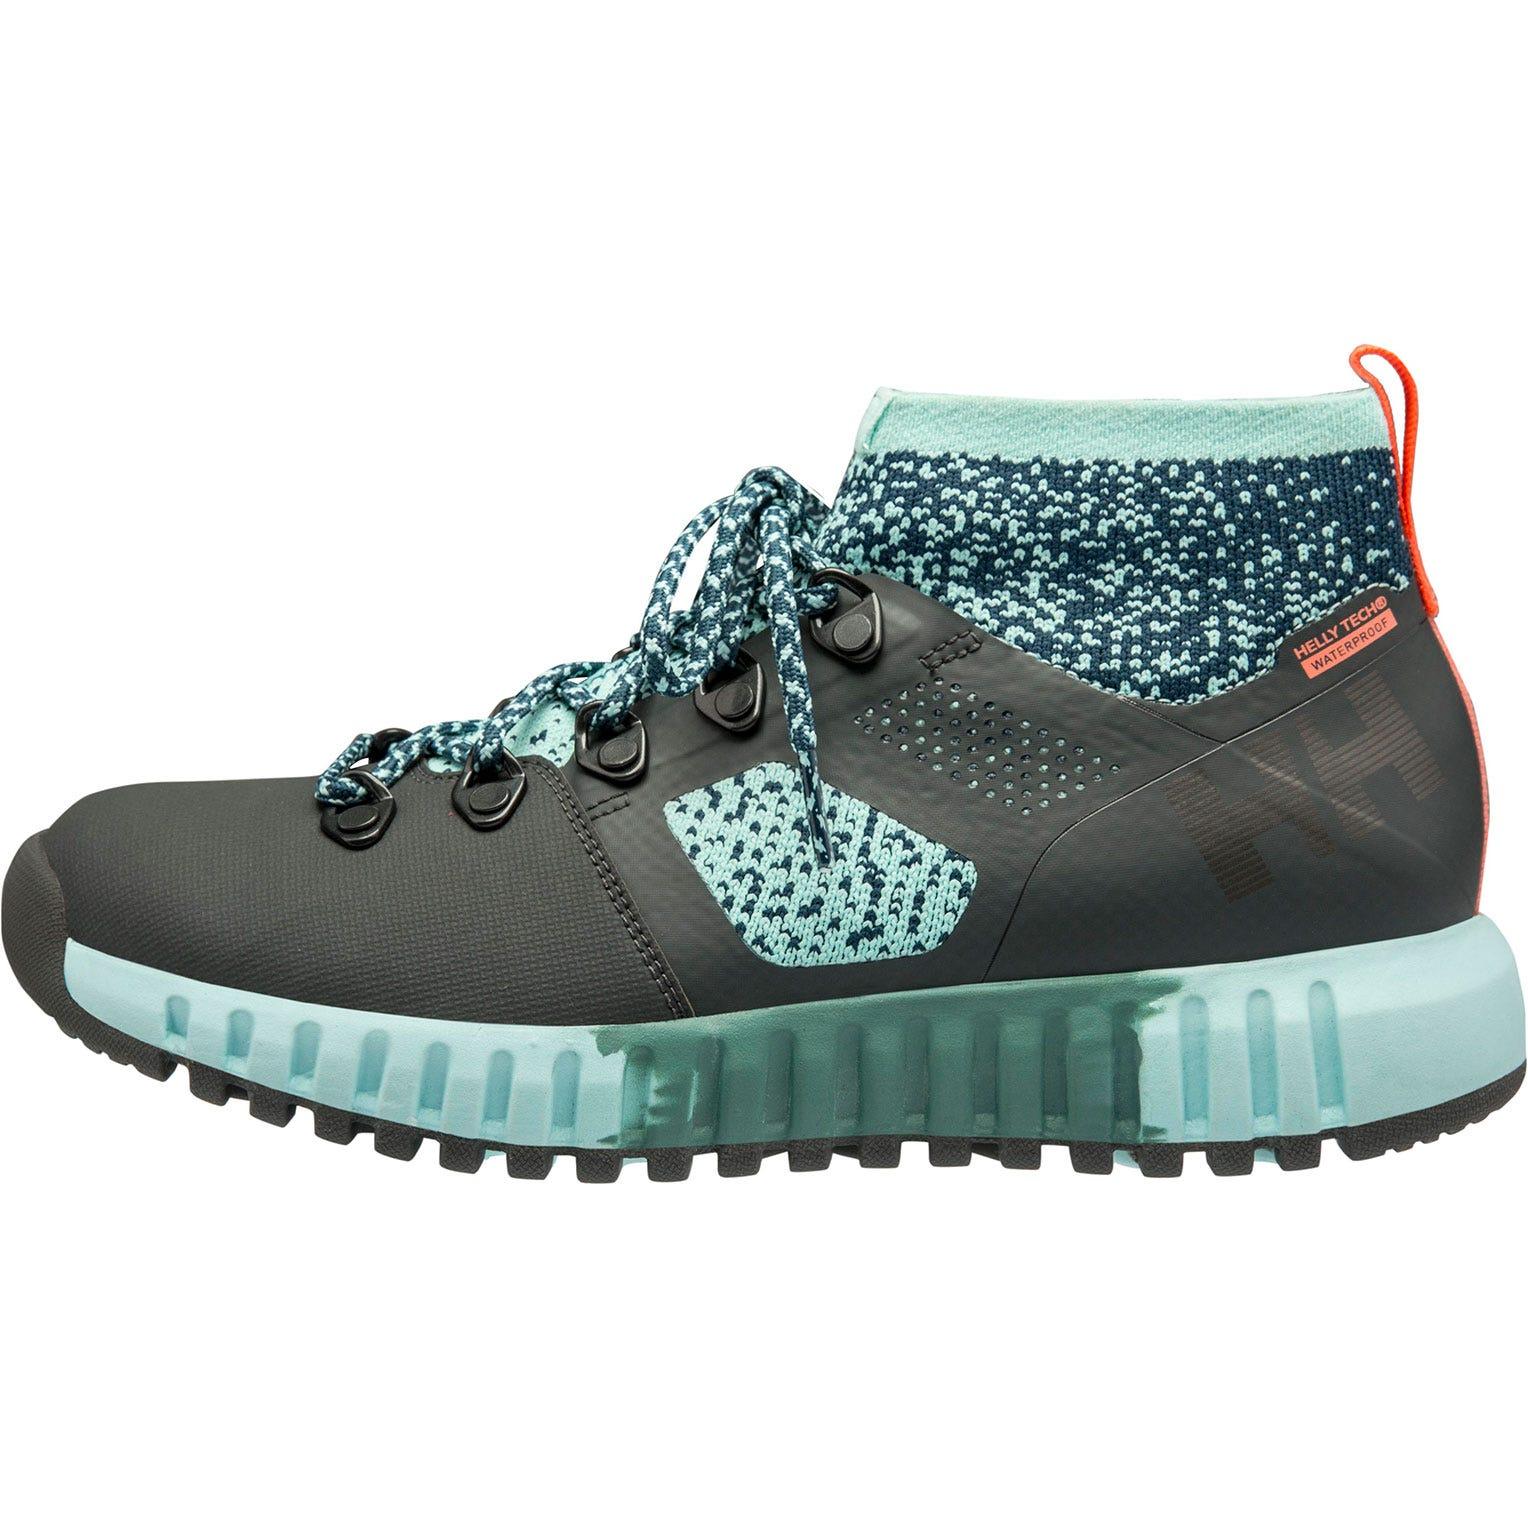 Helly Hansen W Vanir Canter Ht Womens Hiking Boot Black 37.5/6.5